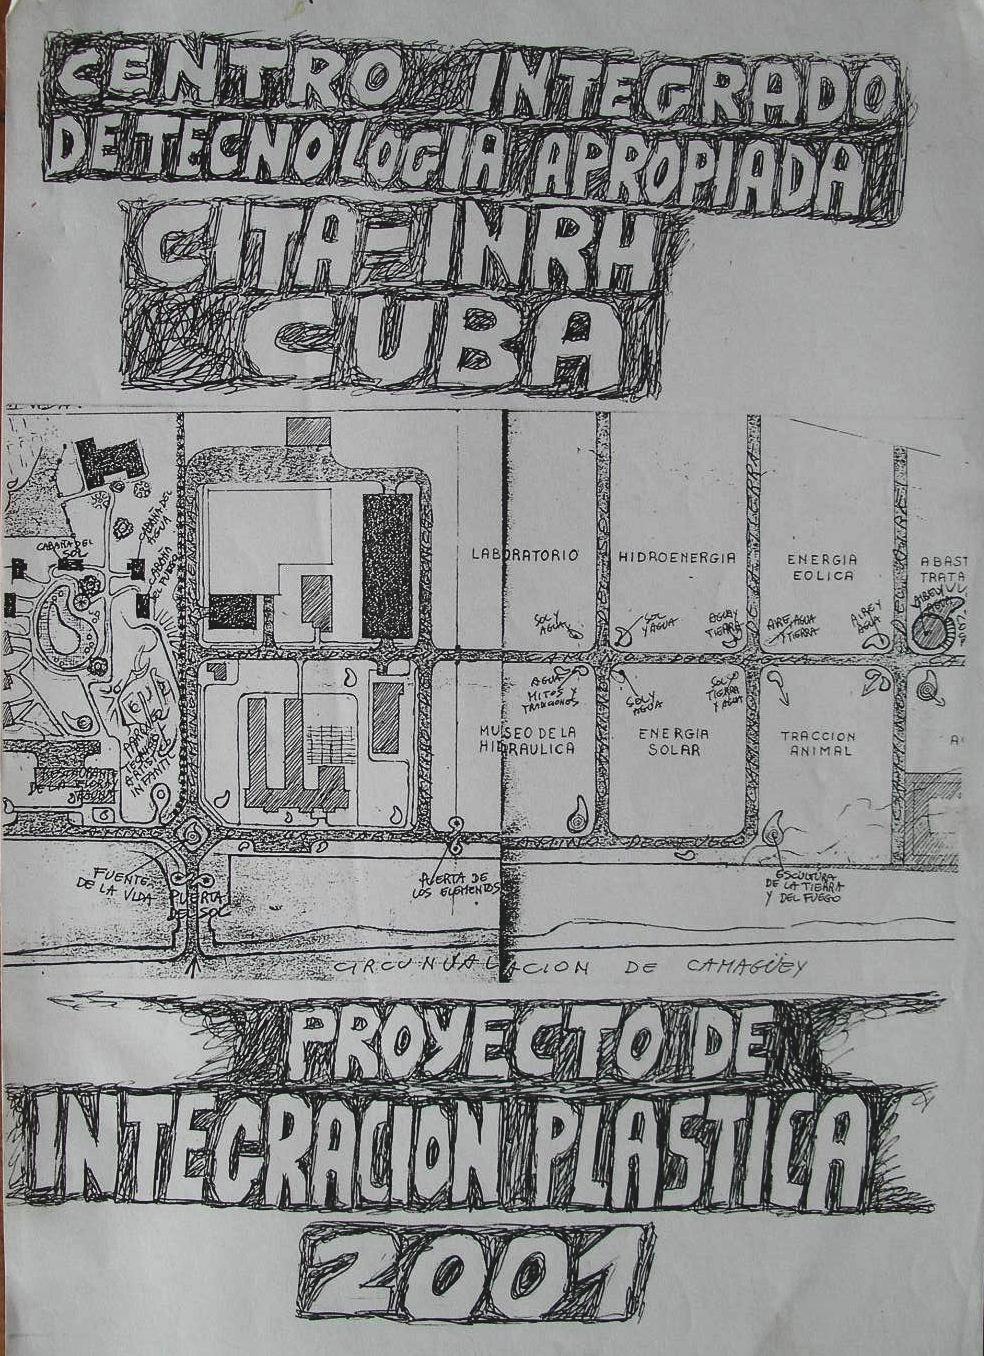 2001-a Progetto d'Arte per Camaguey, Cuba.